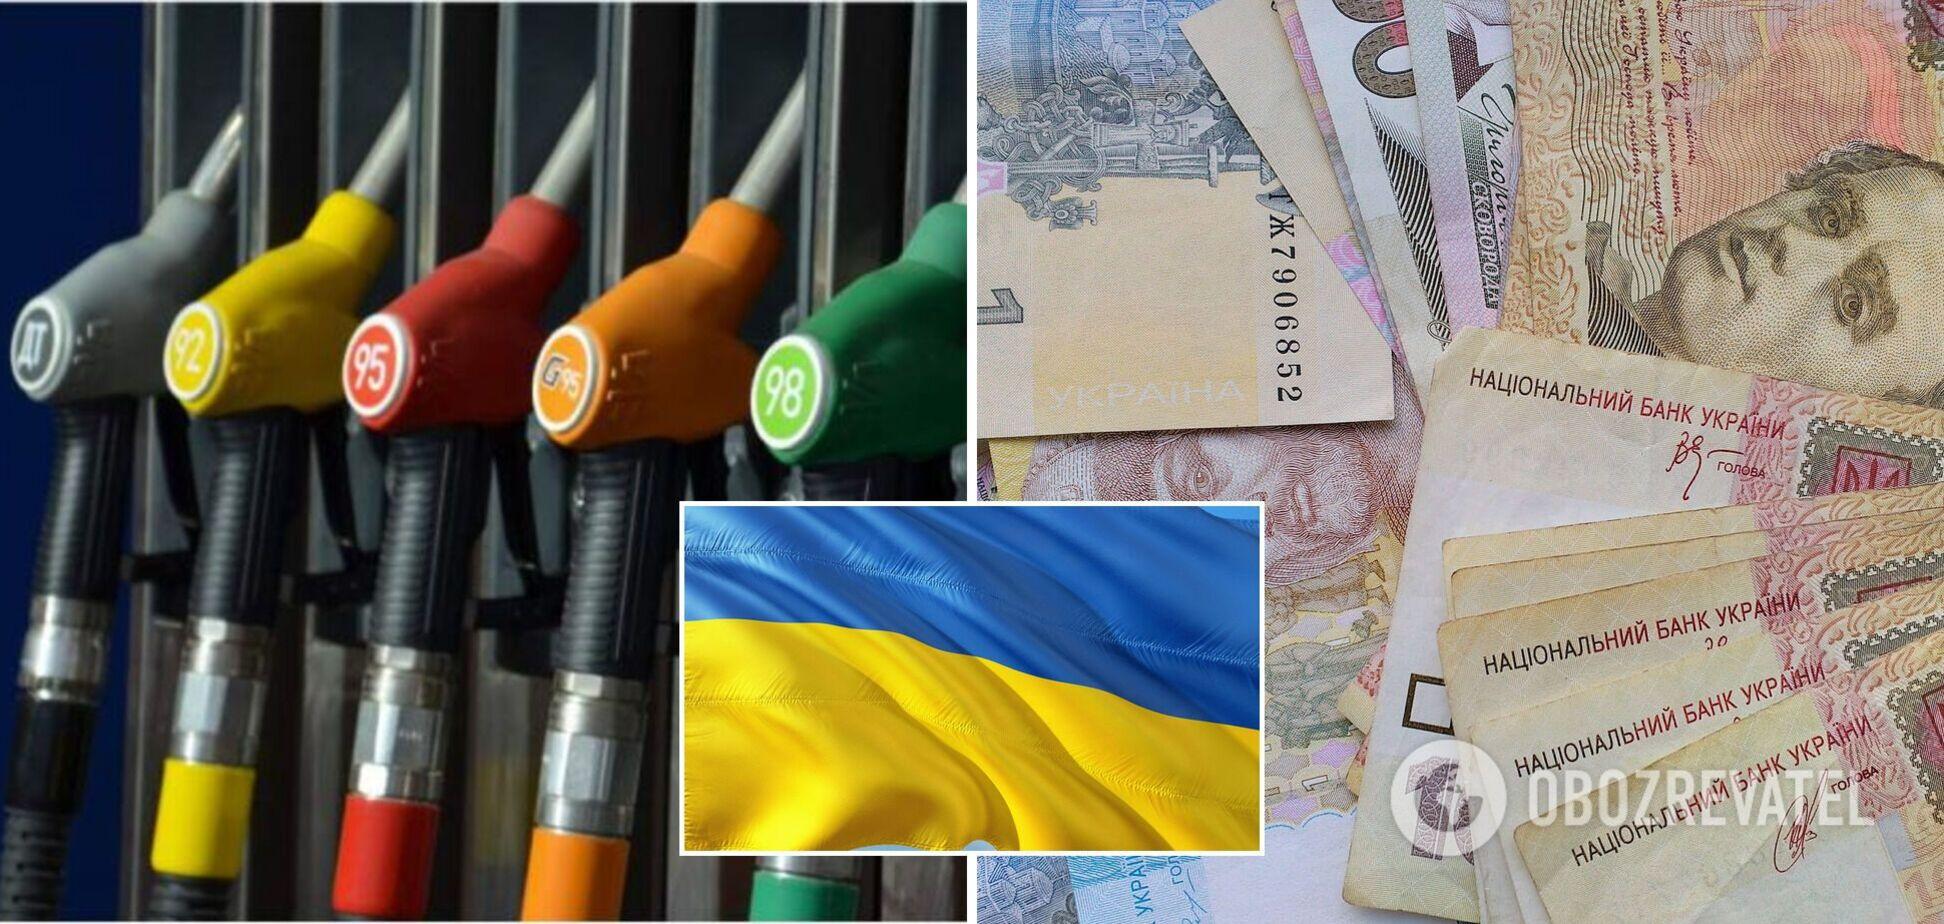 Какими будут цены на бензин и дизтопливо в Украине: озвучен прогноз